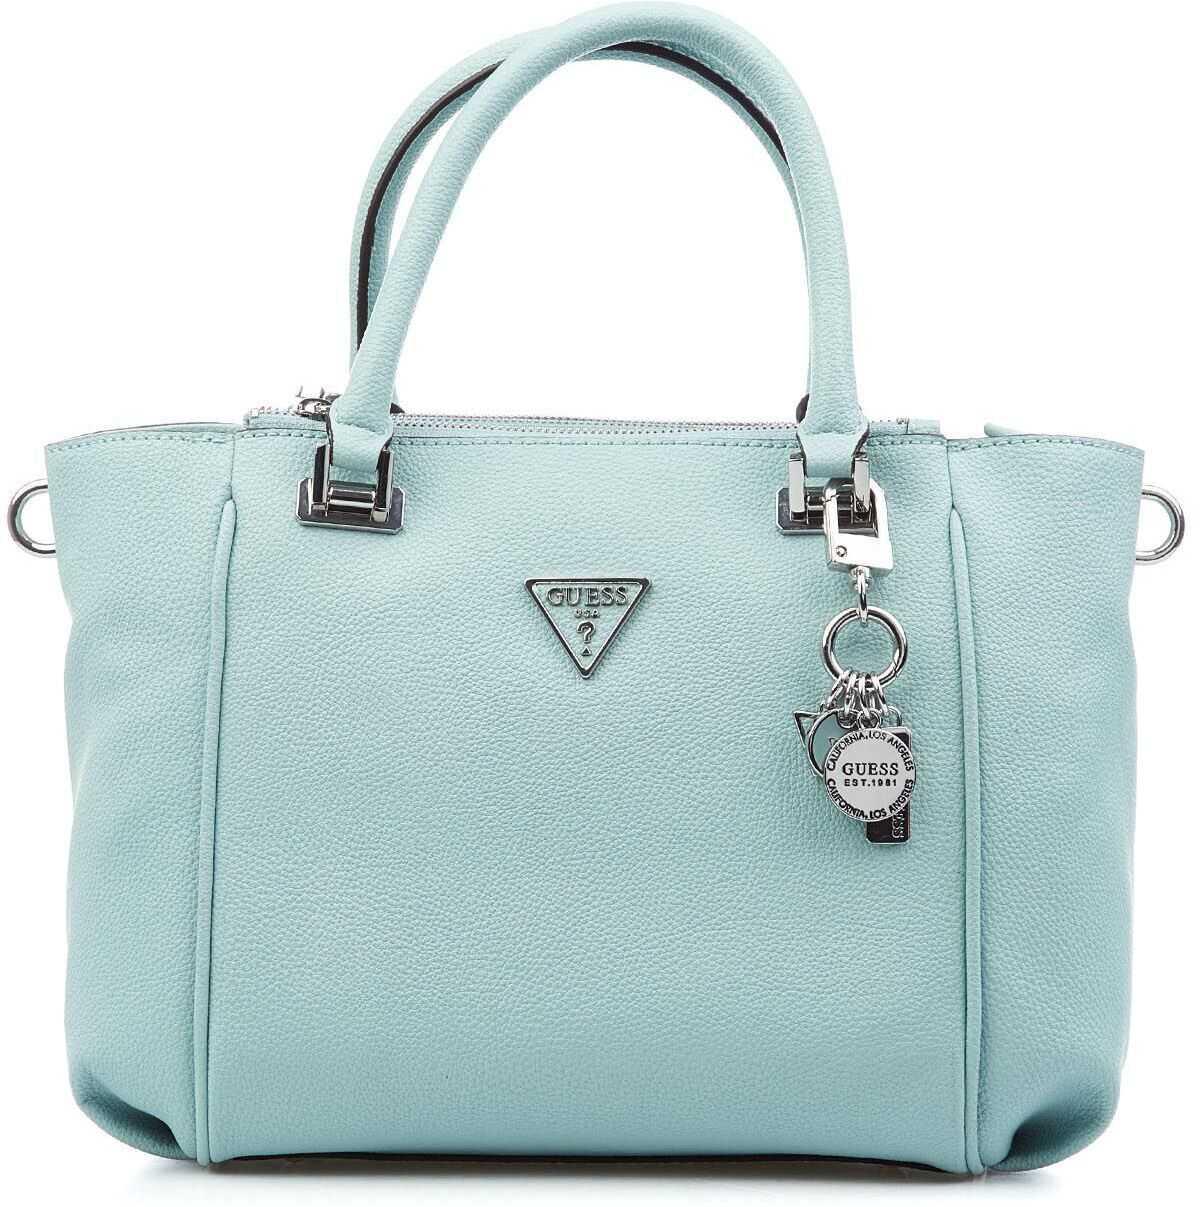 GUESS Handbag with logodetail Blue imagine b-mall.ro